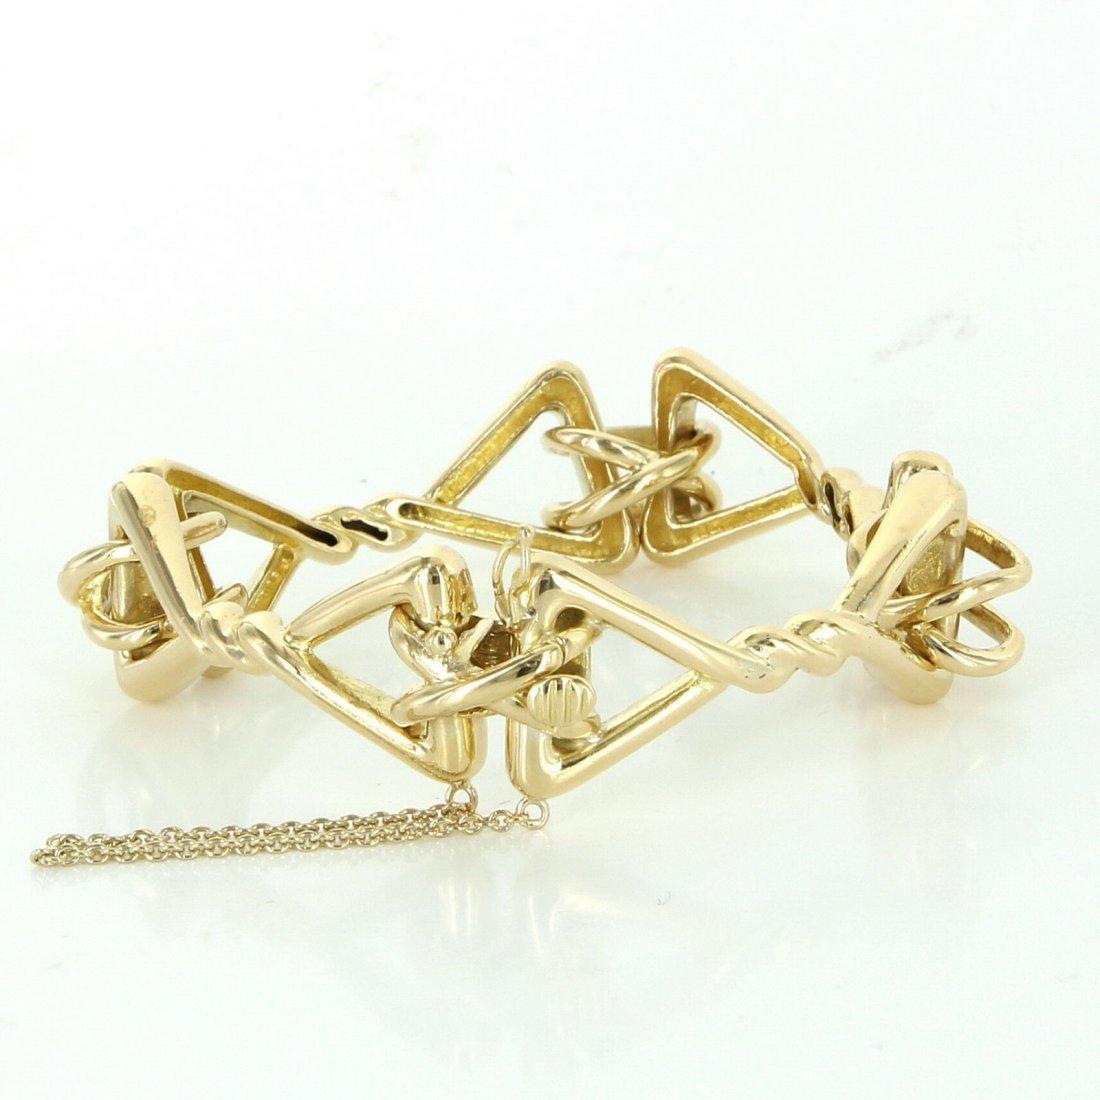 Tiffany & Co 18k Yellow Gold Ornate Vintage Bracelet